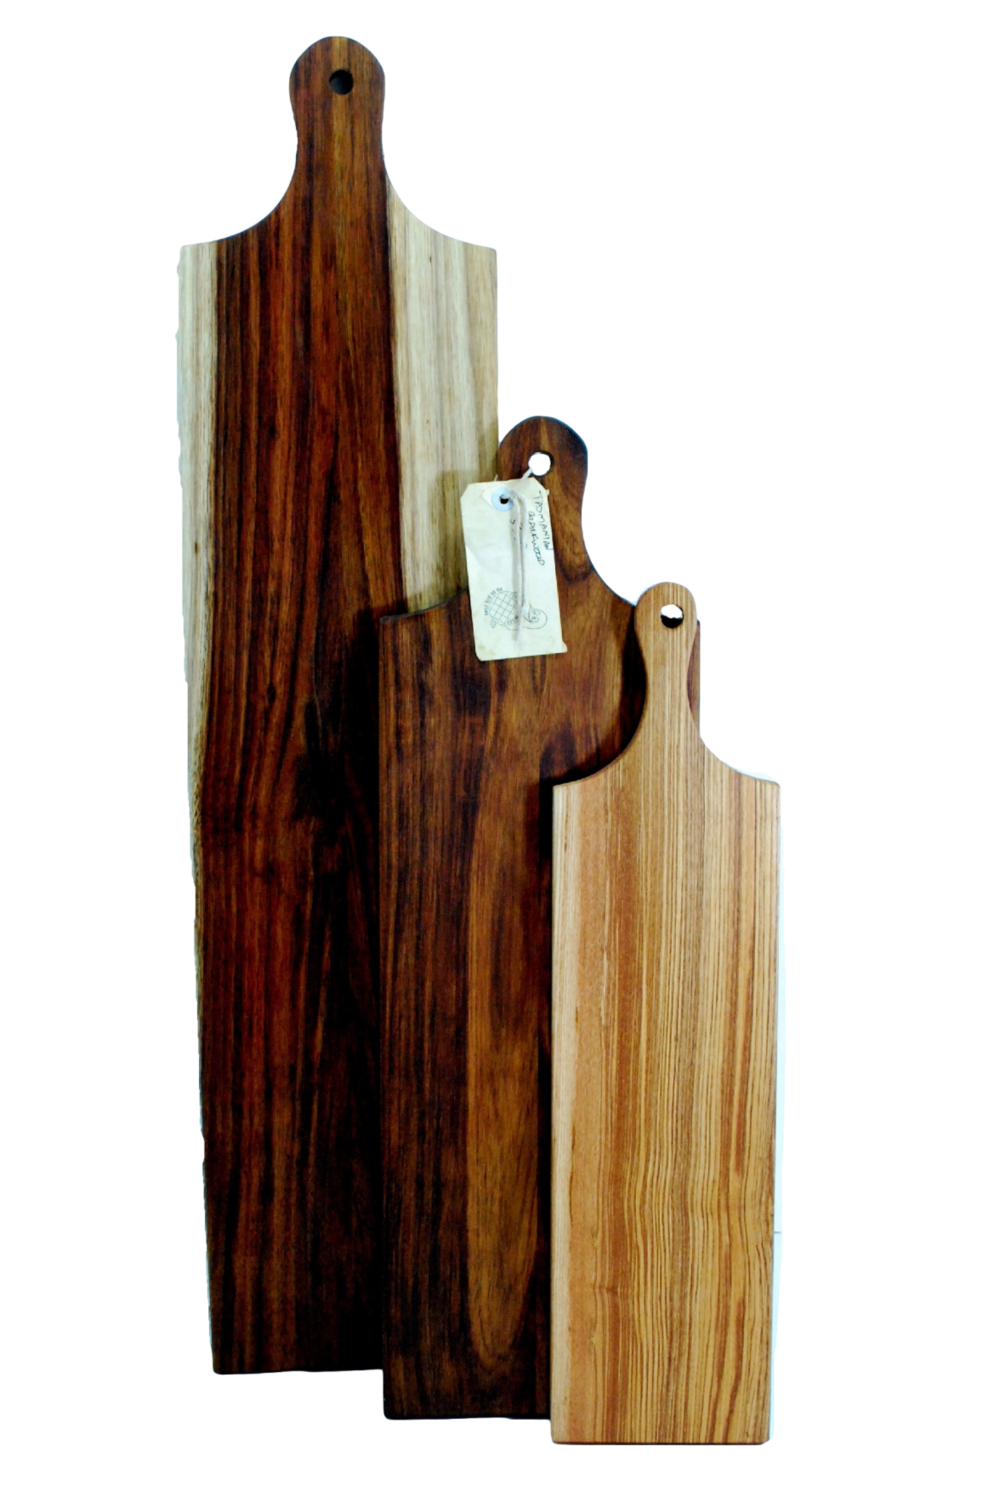 A1 Baguette Boards